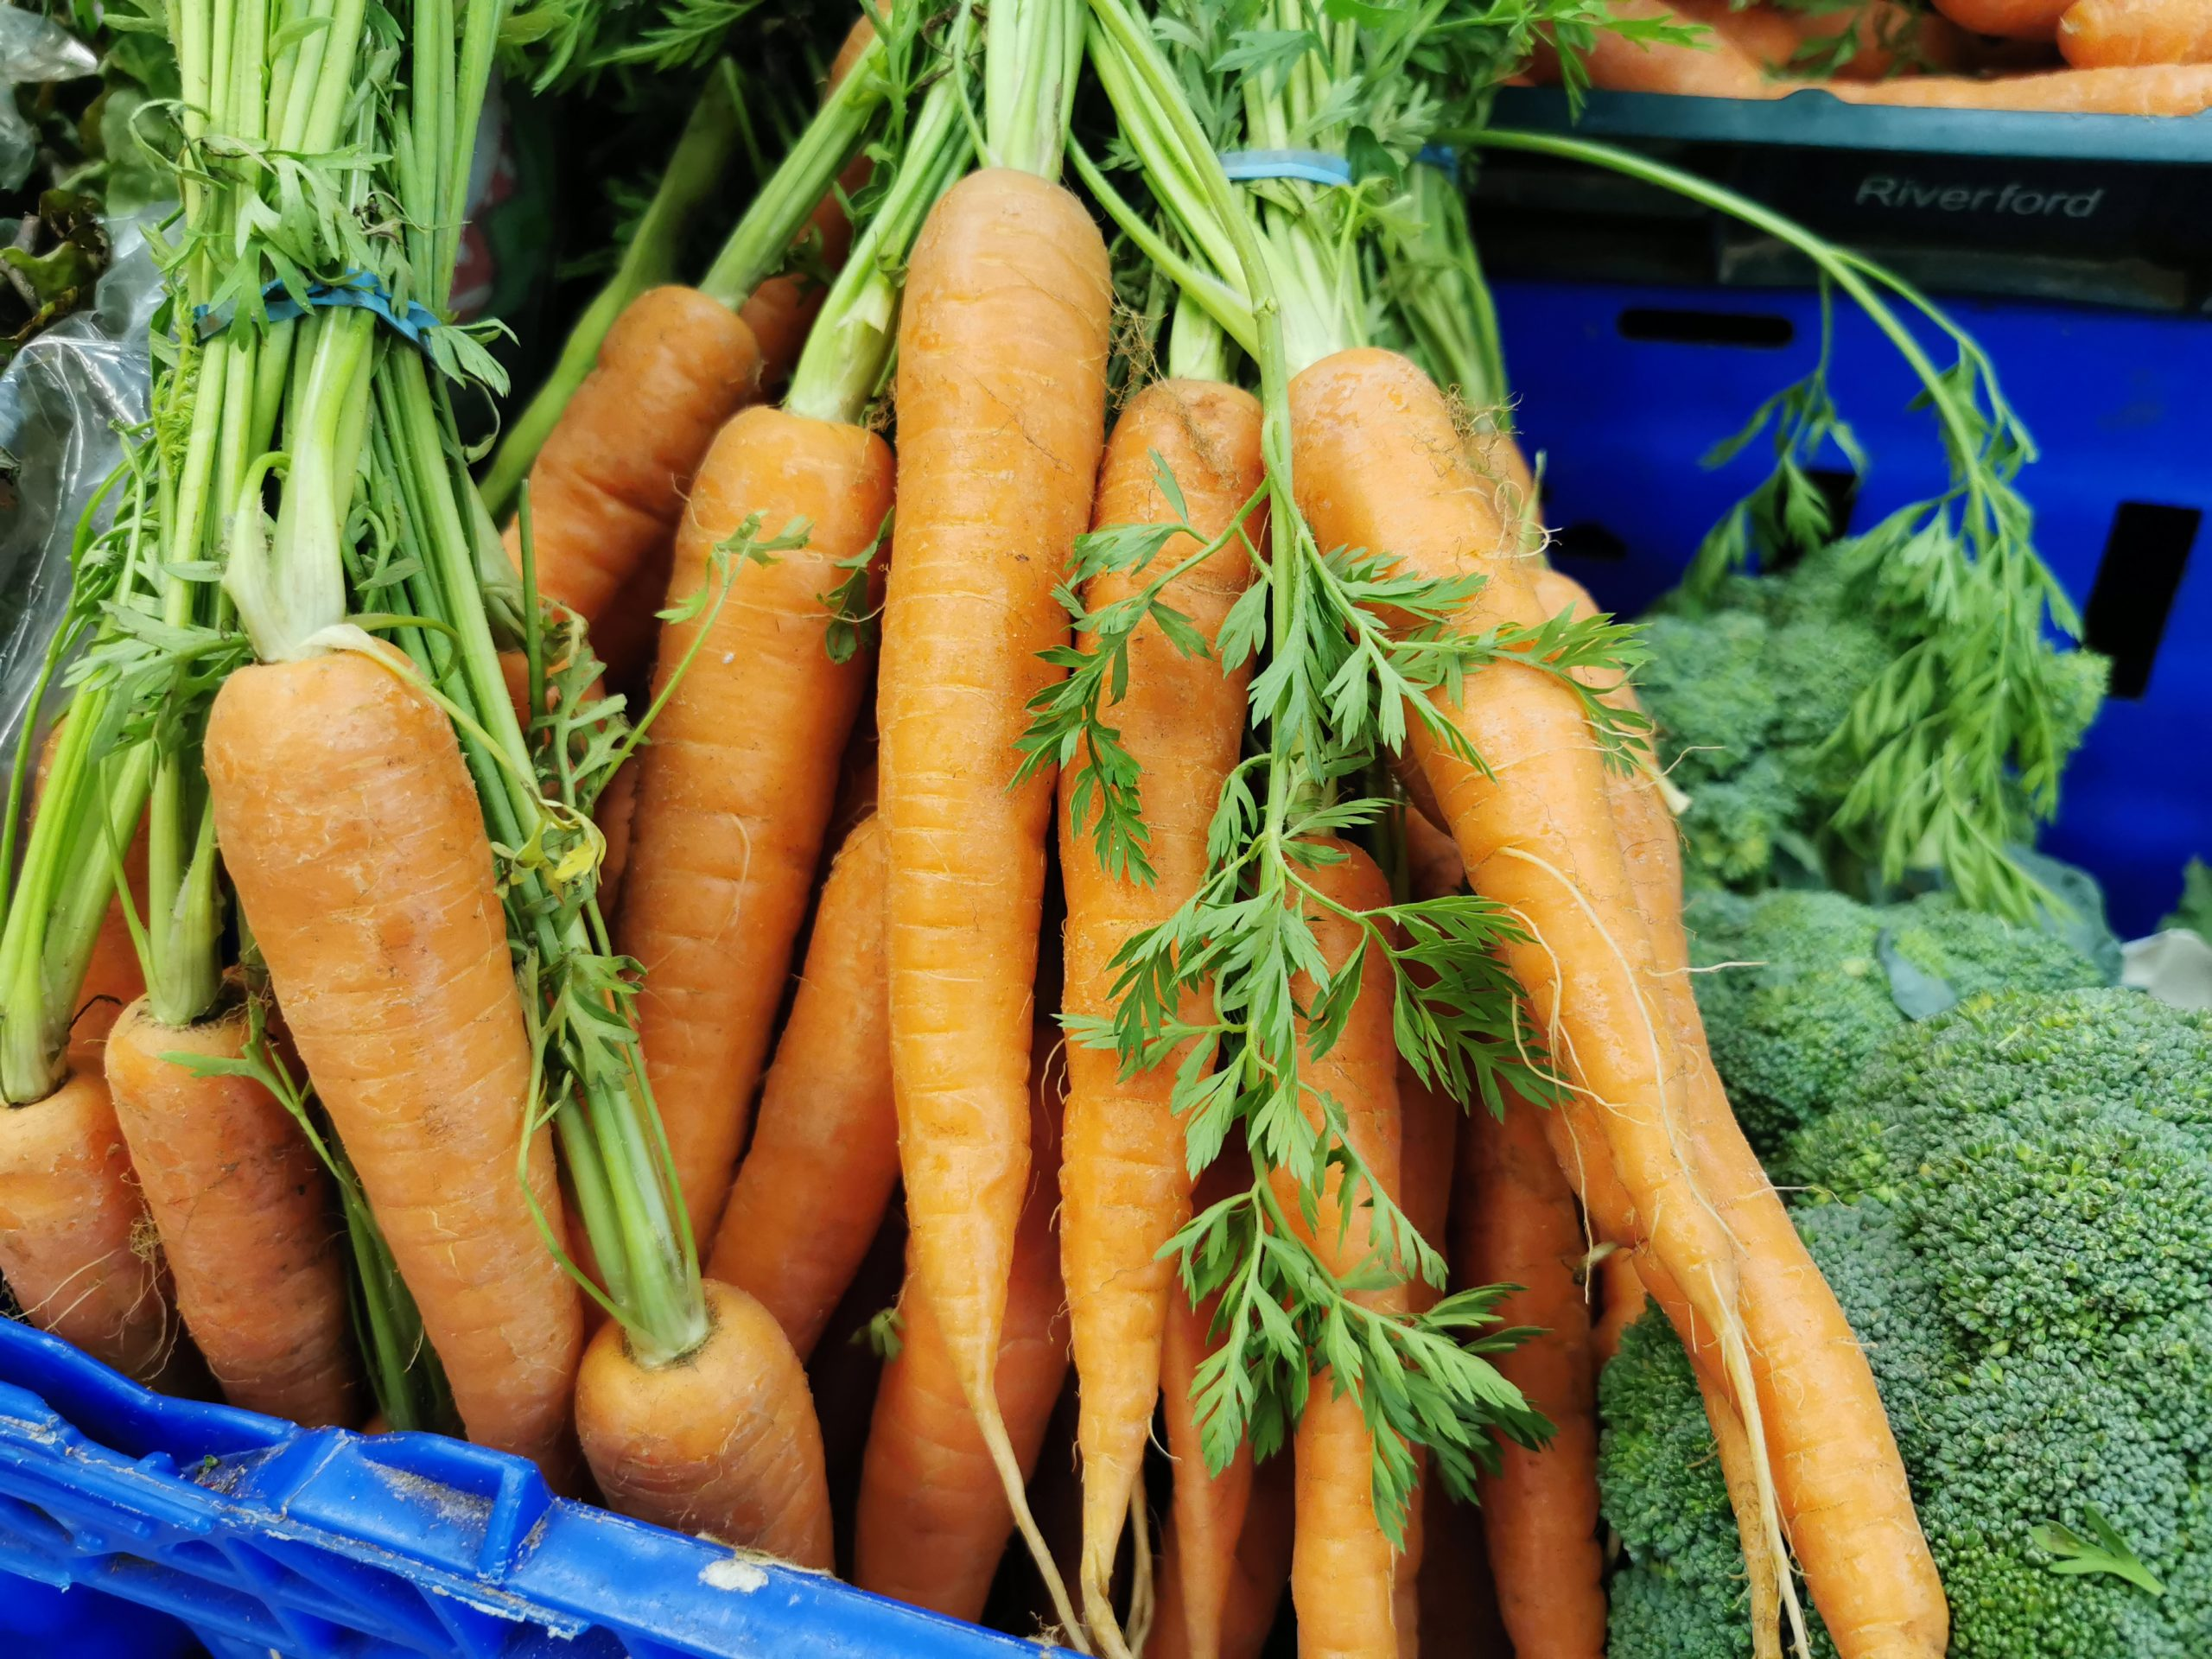 Freshly picked delicious organic carrots from Earthfare's local organic farming range